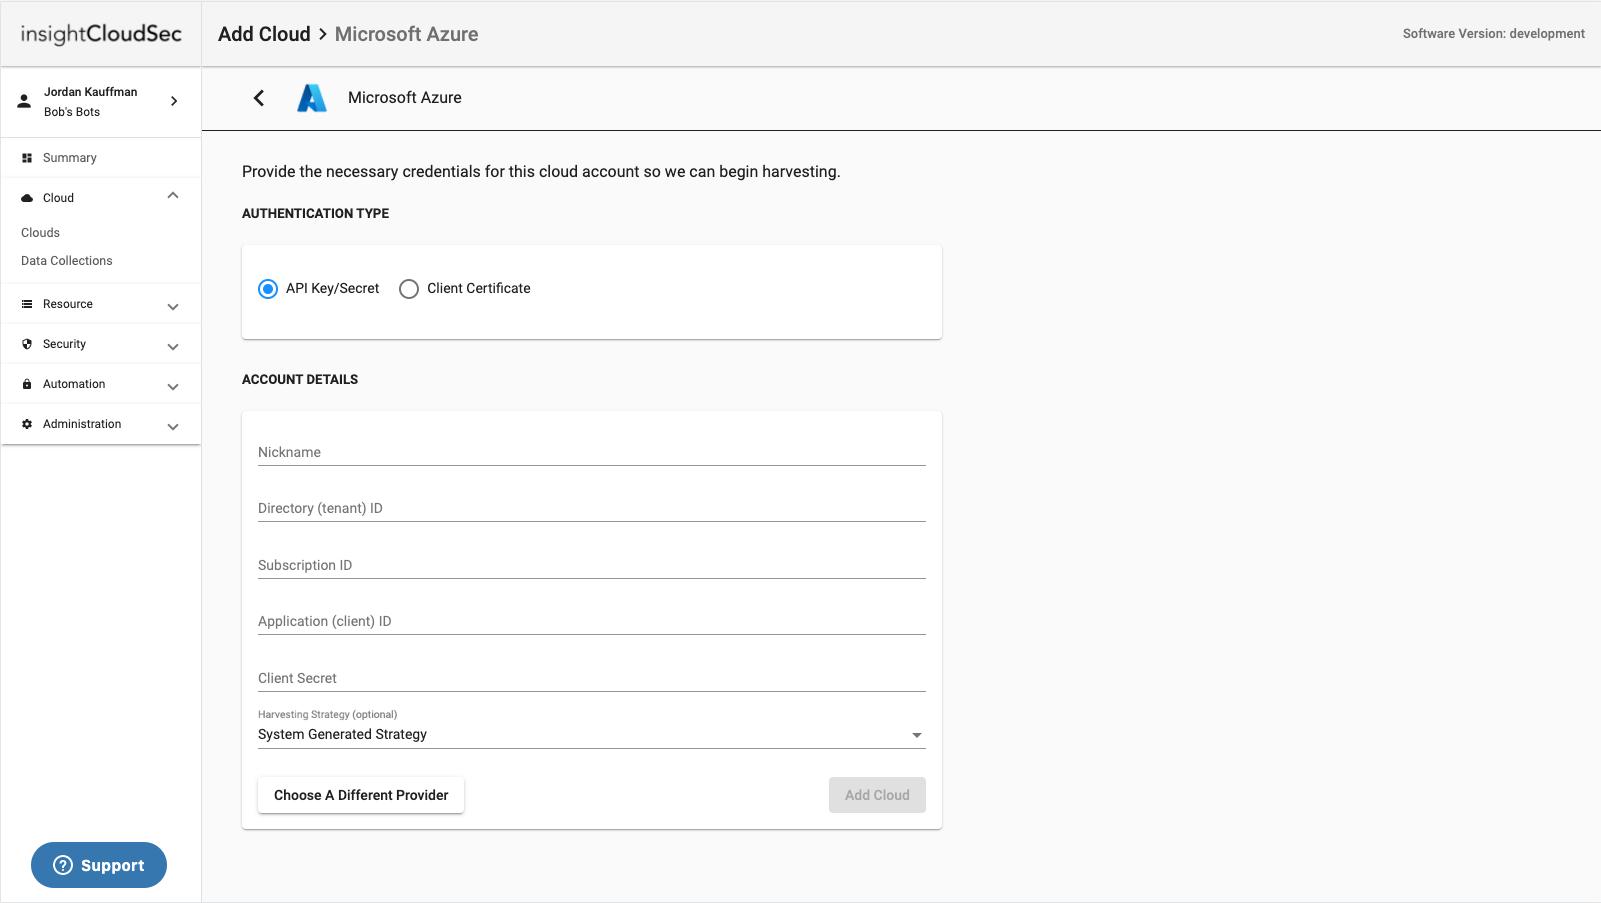 Azure Account Details